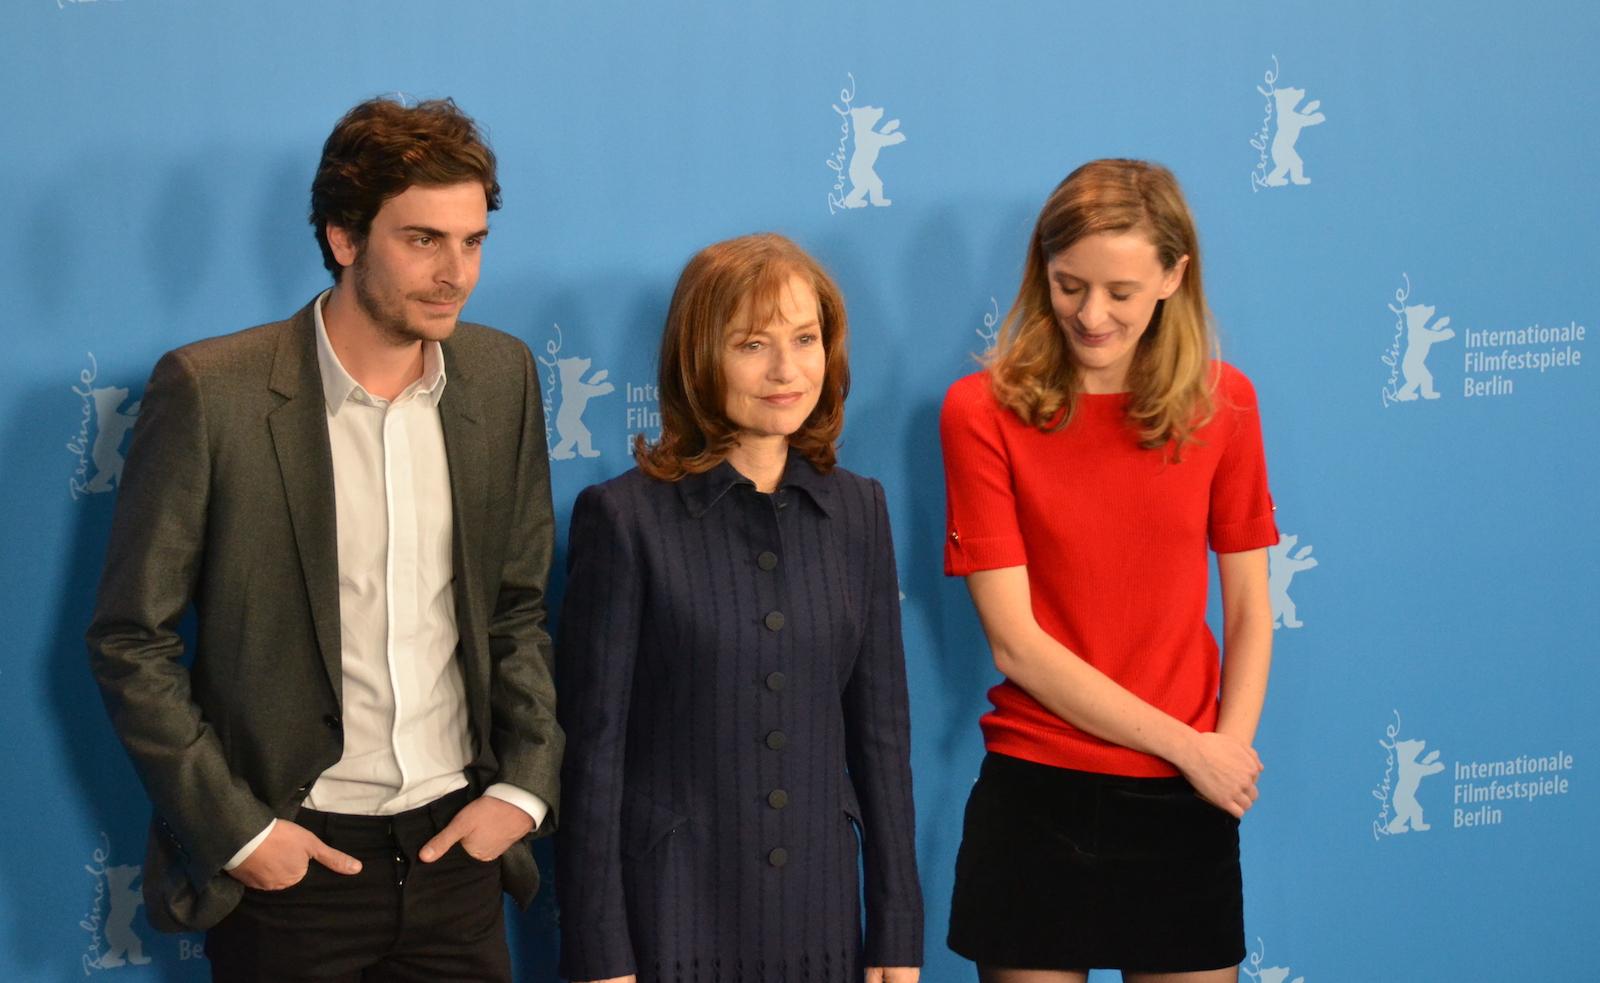 Berlino 2016: Mia Hansen-Løve, Roman Kalinka e Isabelle Huppert posano al photocall di Things To Come